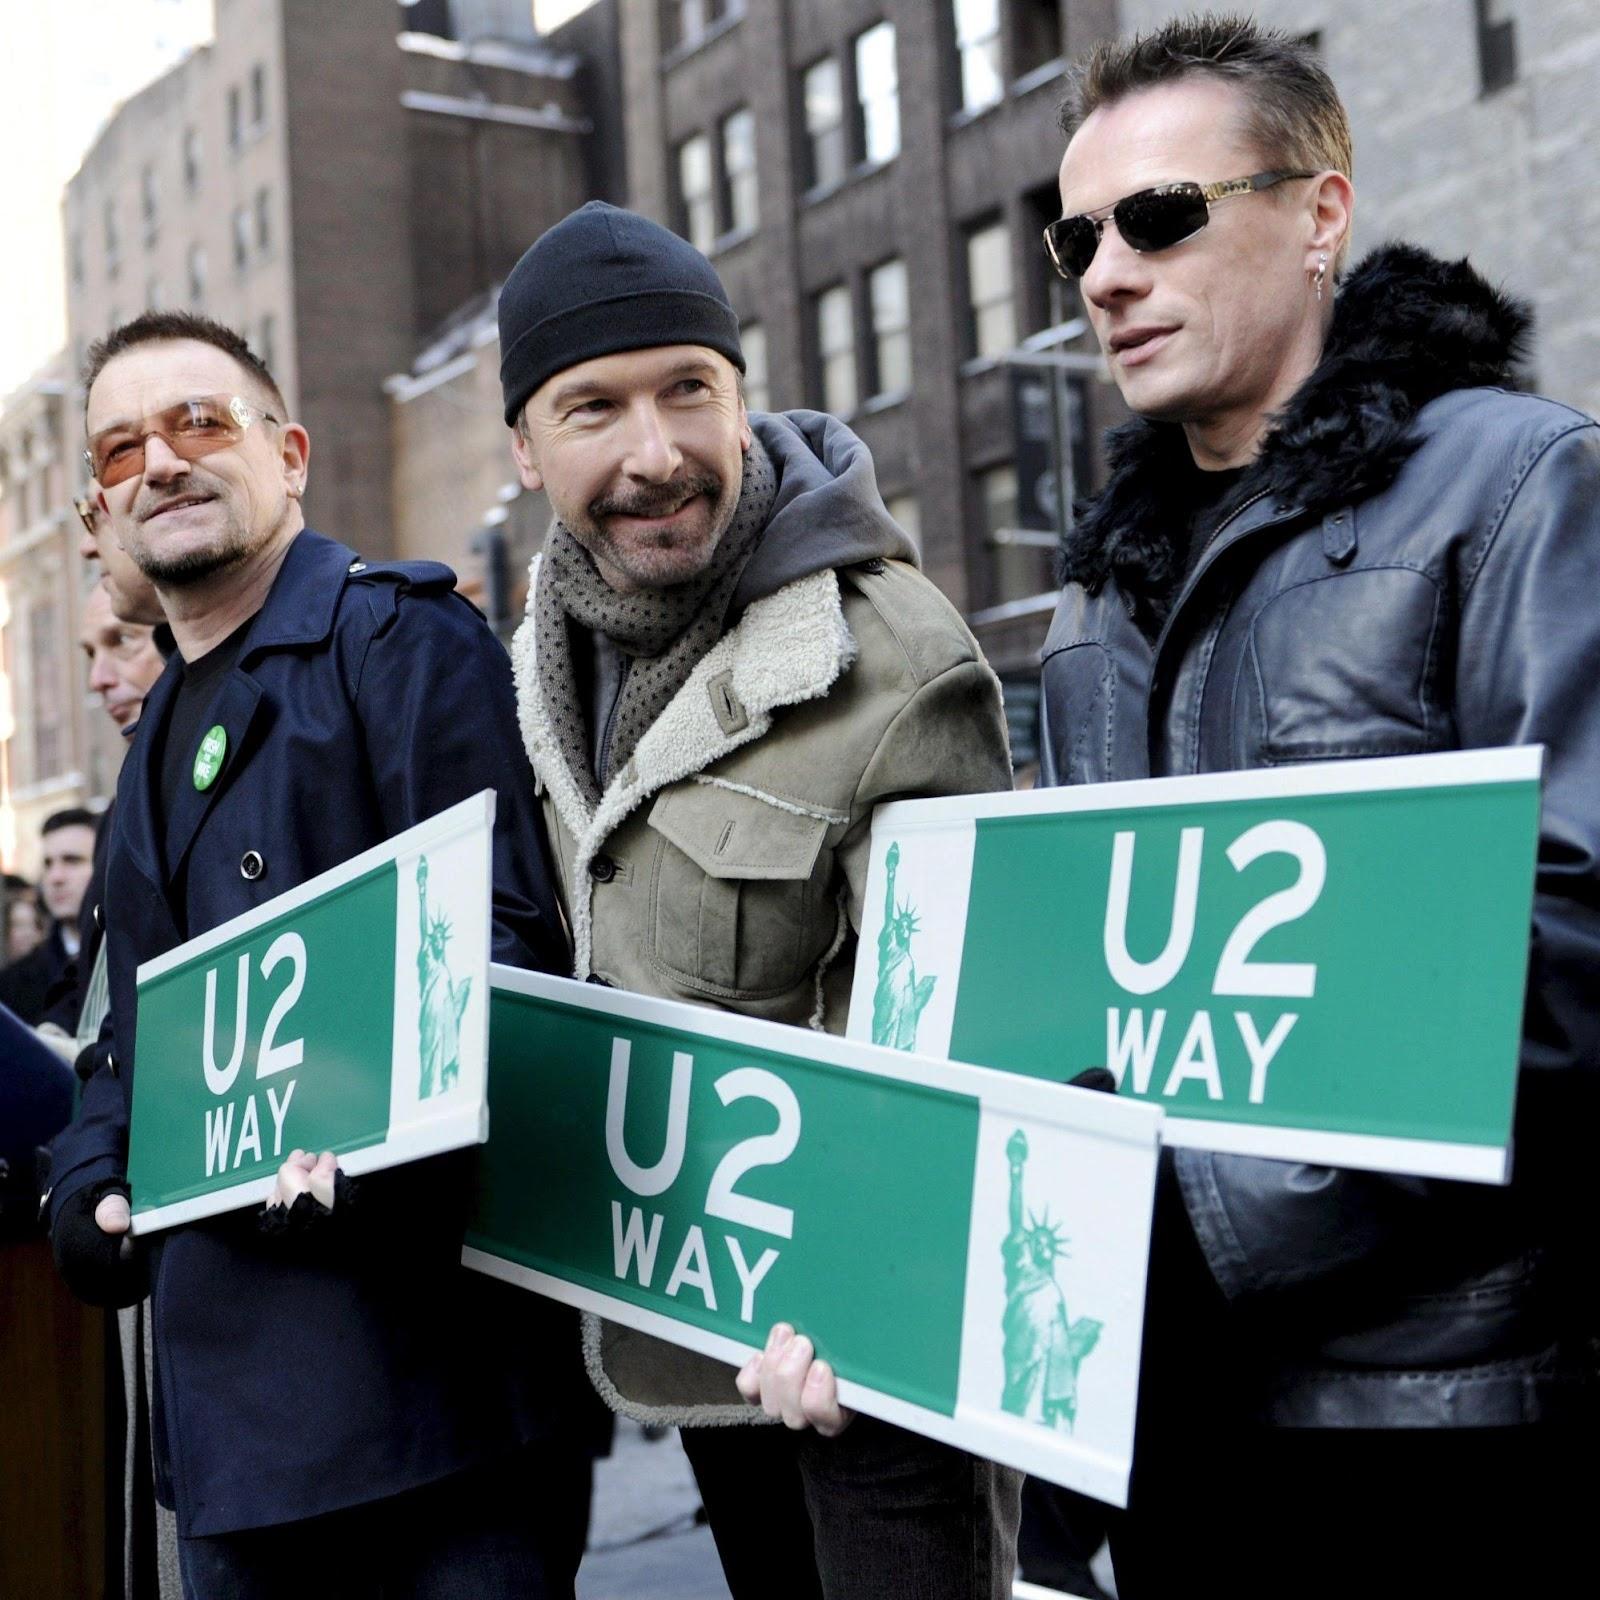 U2 Songs of innocence', gratis en iTunes FfKTt_Ai3rQrDSCga5KO1E1OQ6thqxuc8k61PTRGJU-rbUYxX9xlqEDtabrYsrf7Y5LkyYPGZOMFVAWKT07aQIqA5mKOQ-aFLiOfd0zzZ_yOWk3EfKmT8ubk47Kw1reGBA